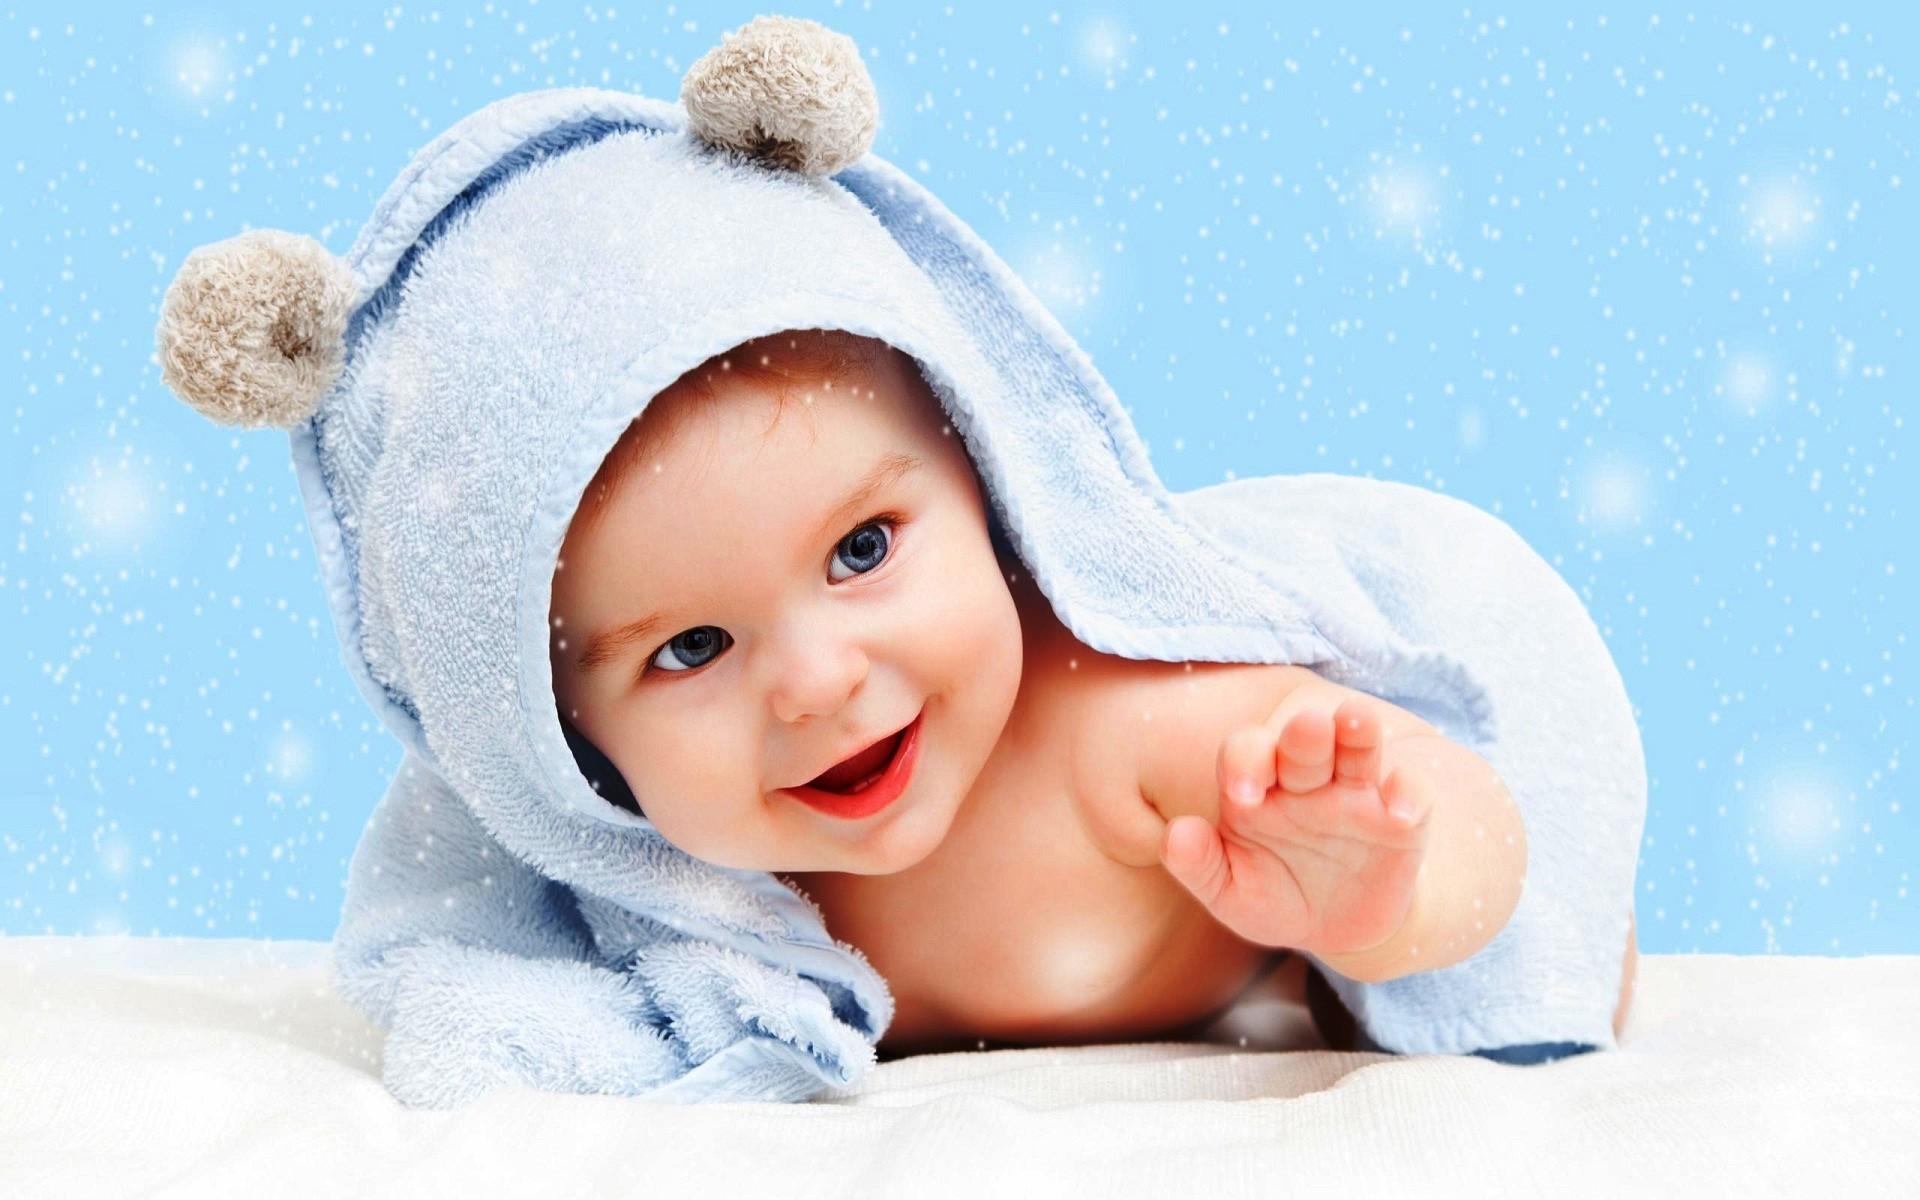 Cute Boy Wallpaper 72 Images